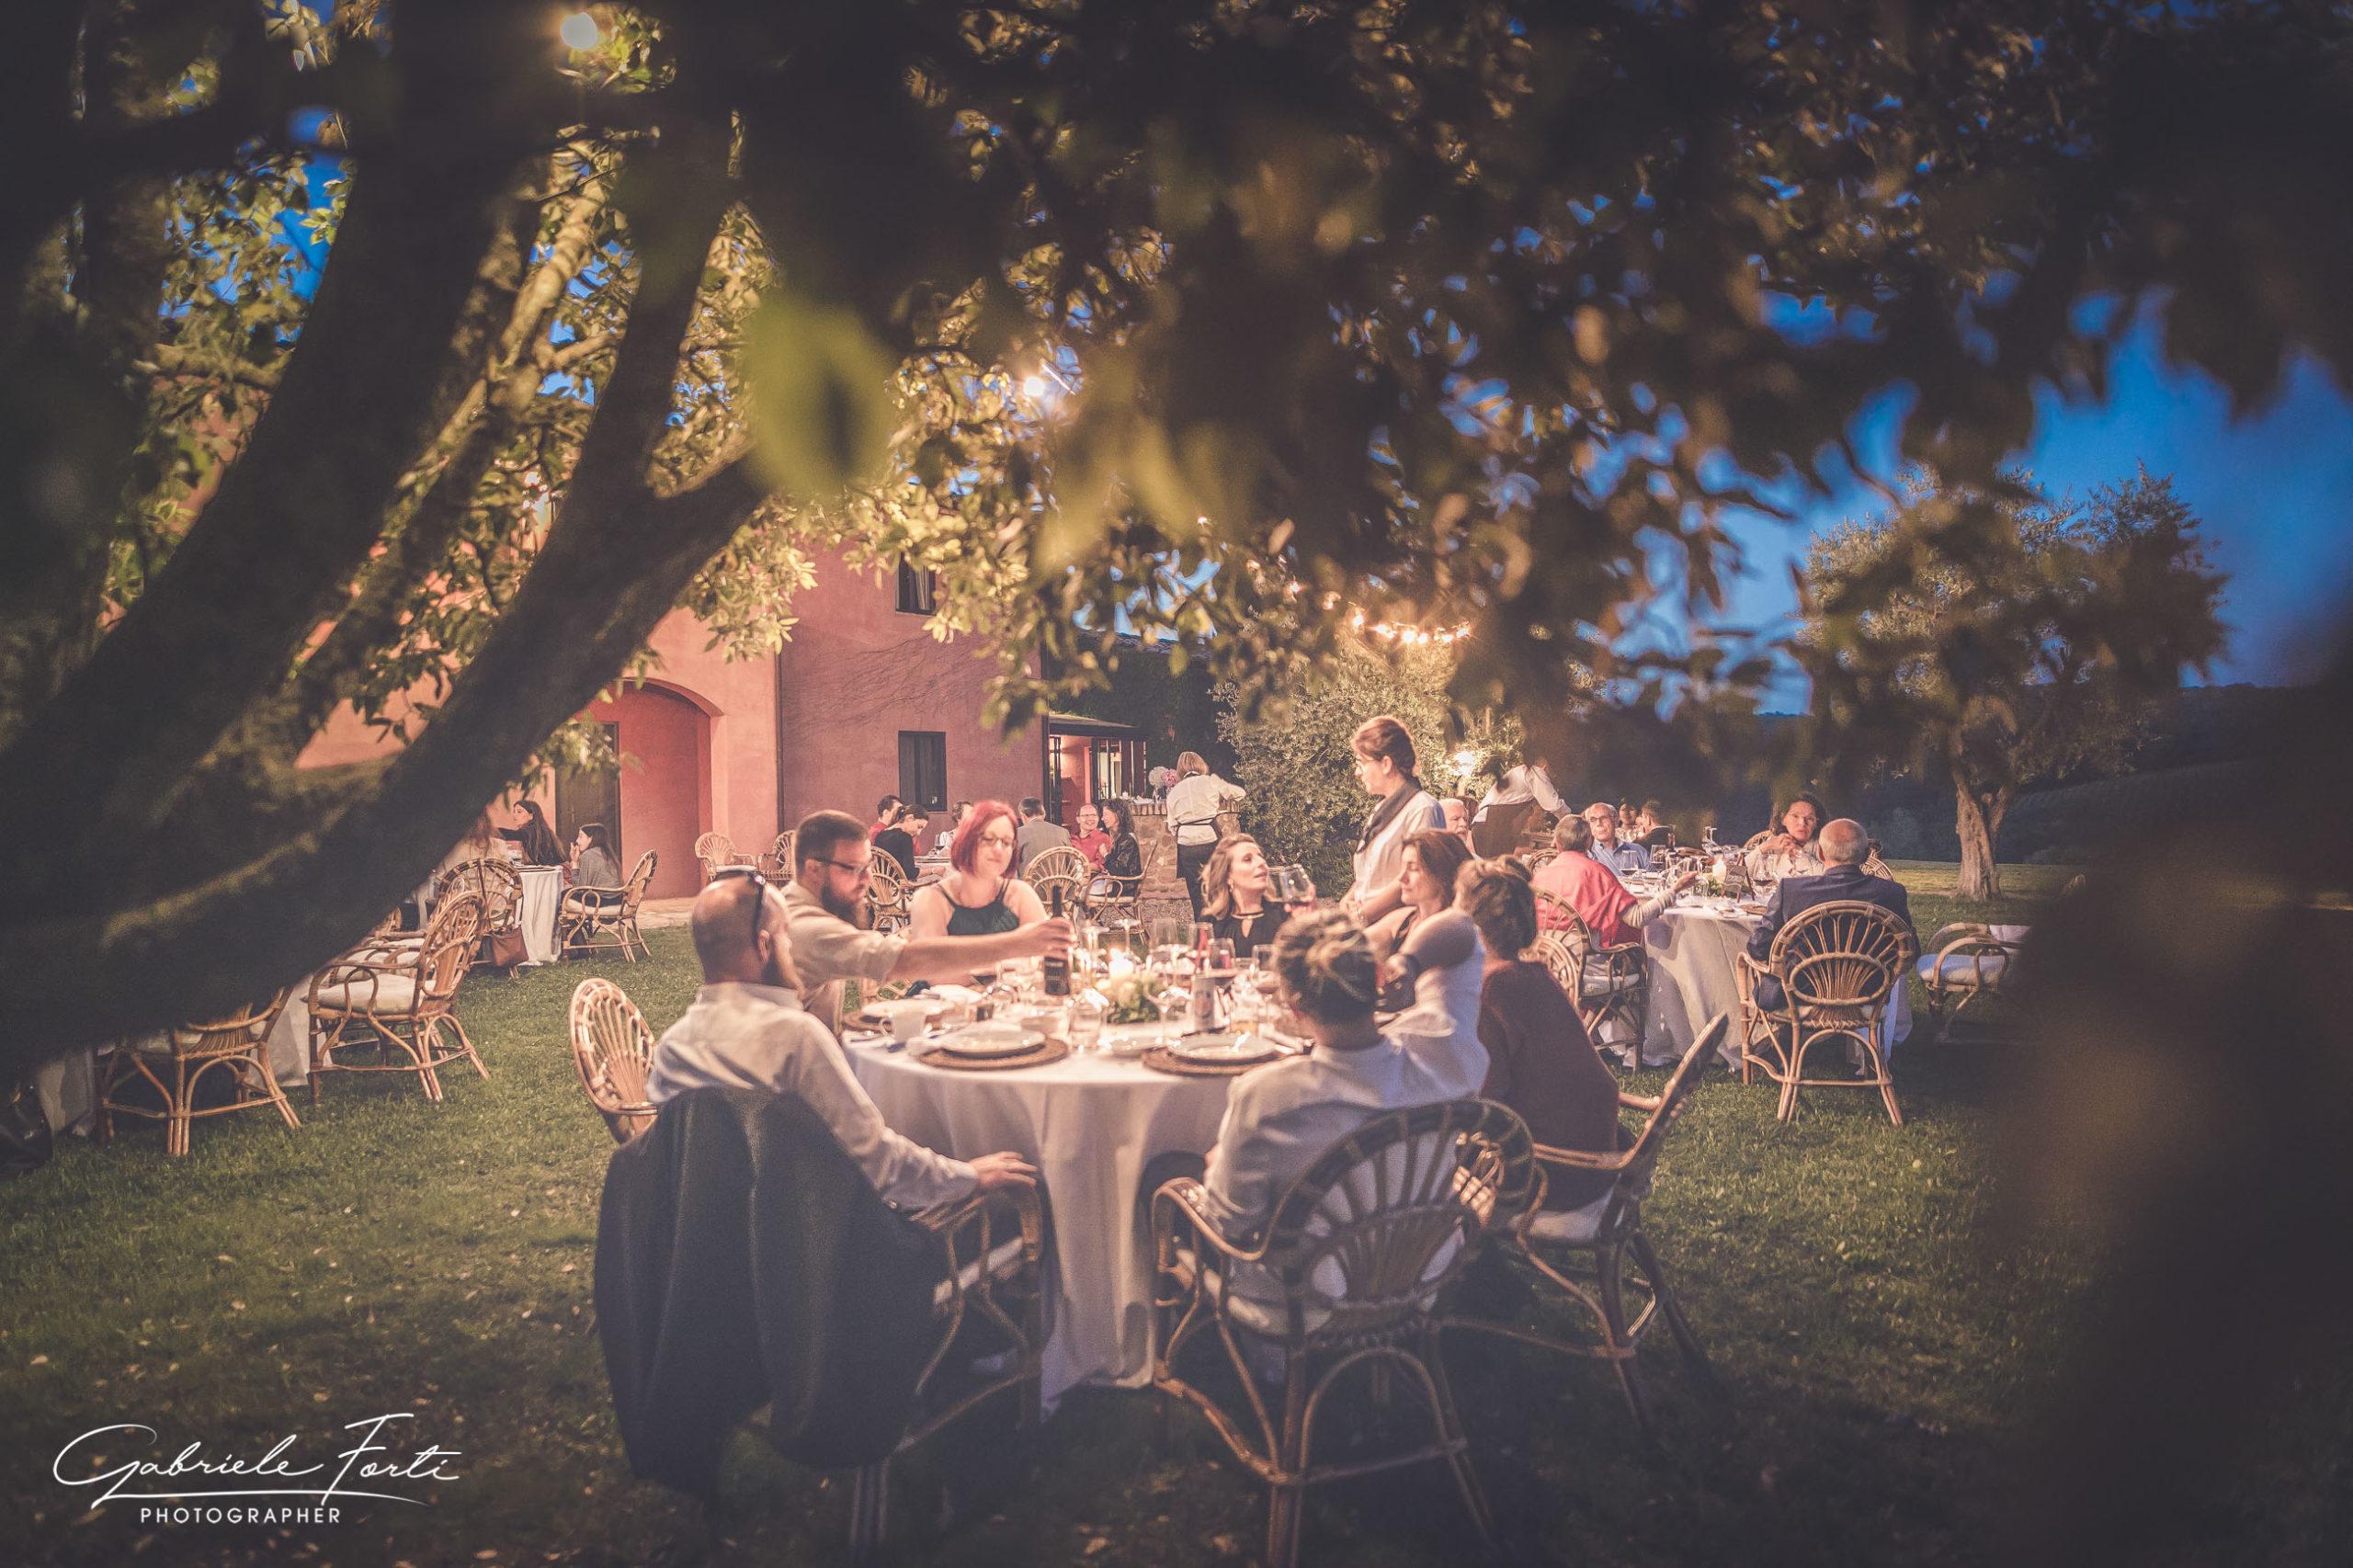 castello-banfi-wedding-piani-rossi-photo-shooting-italy-foto-forti-wedding-4